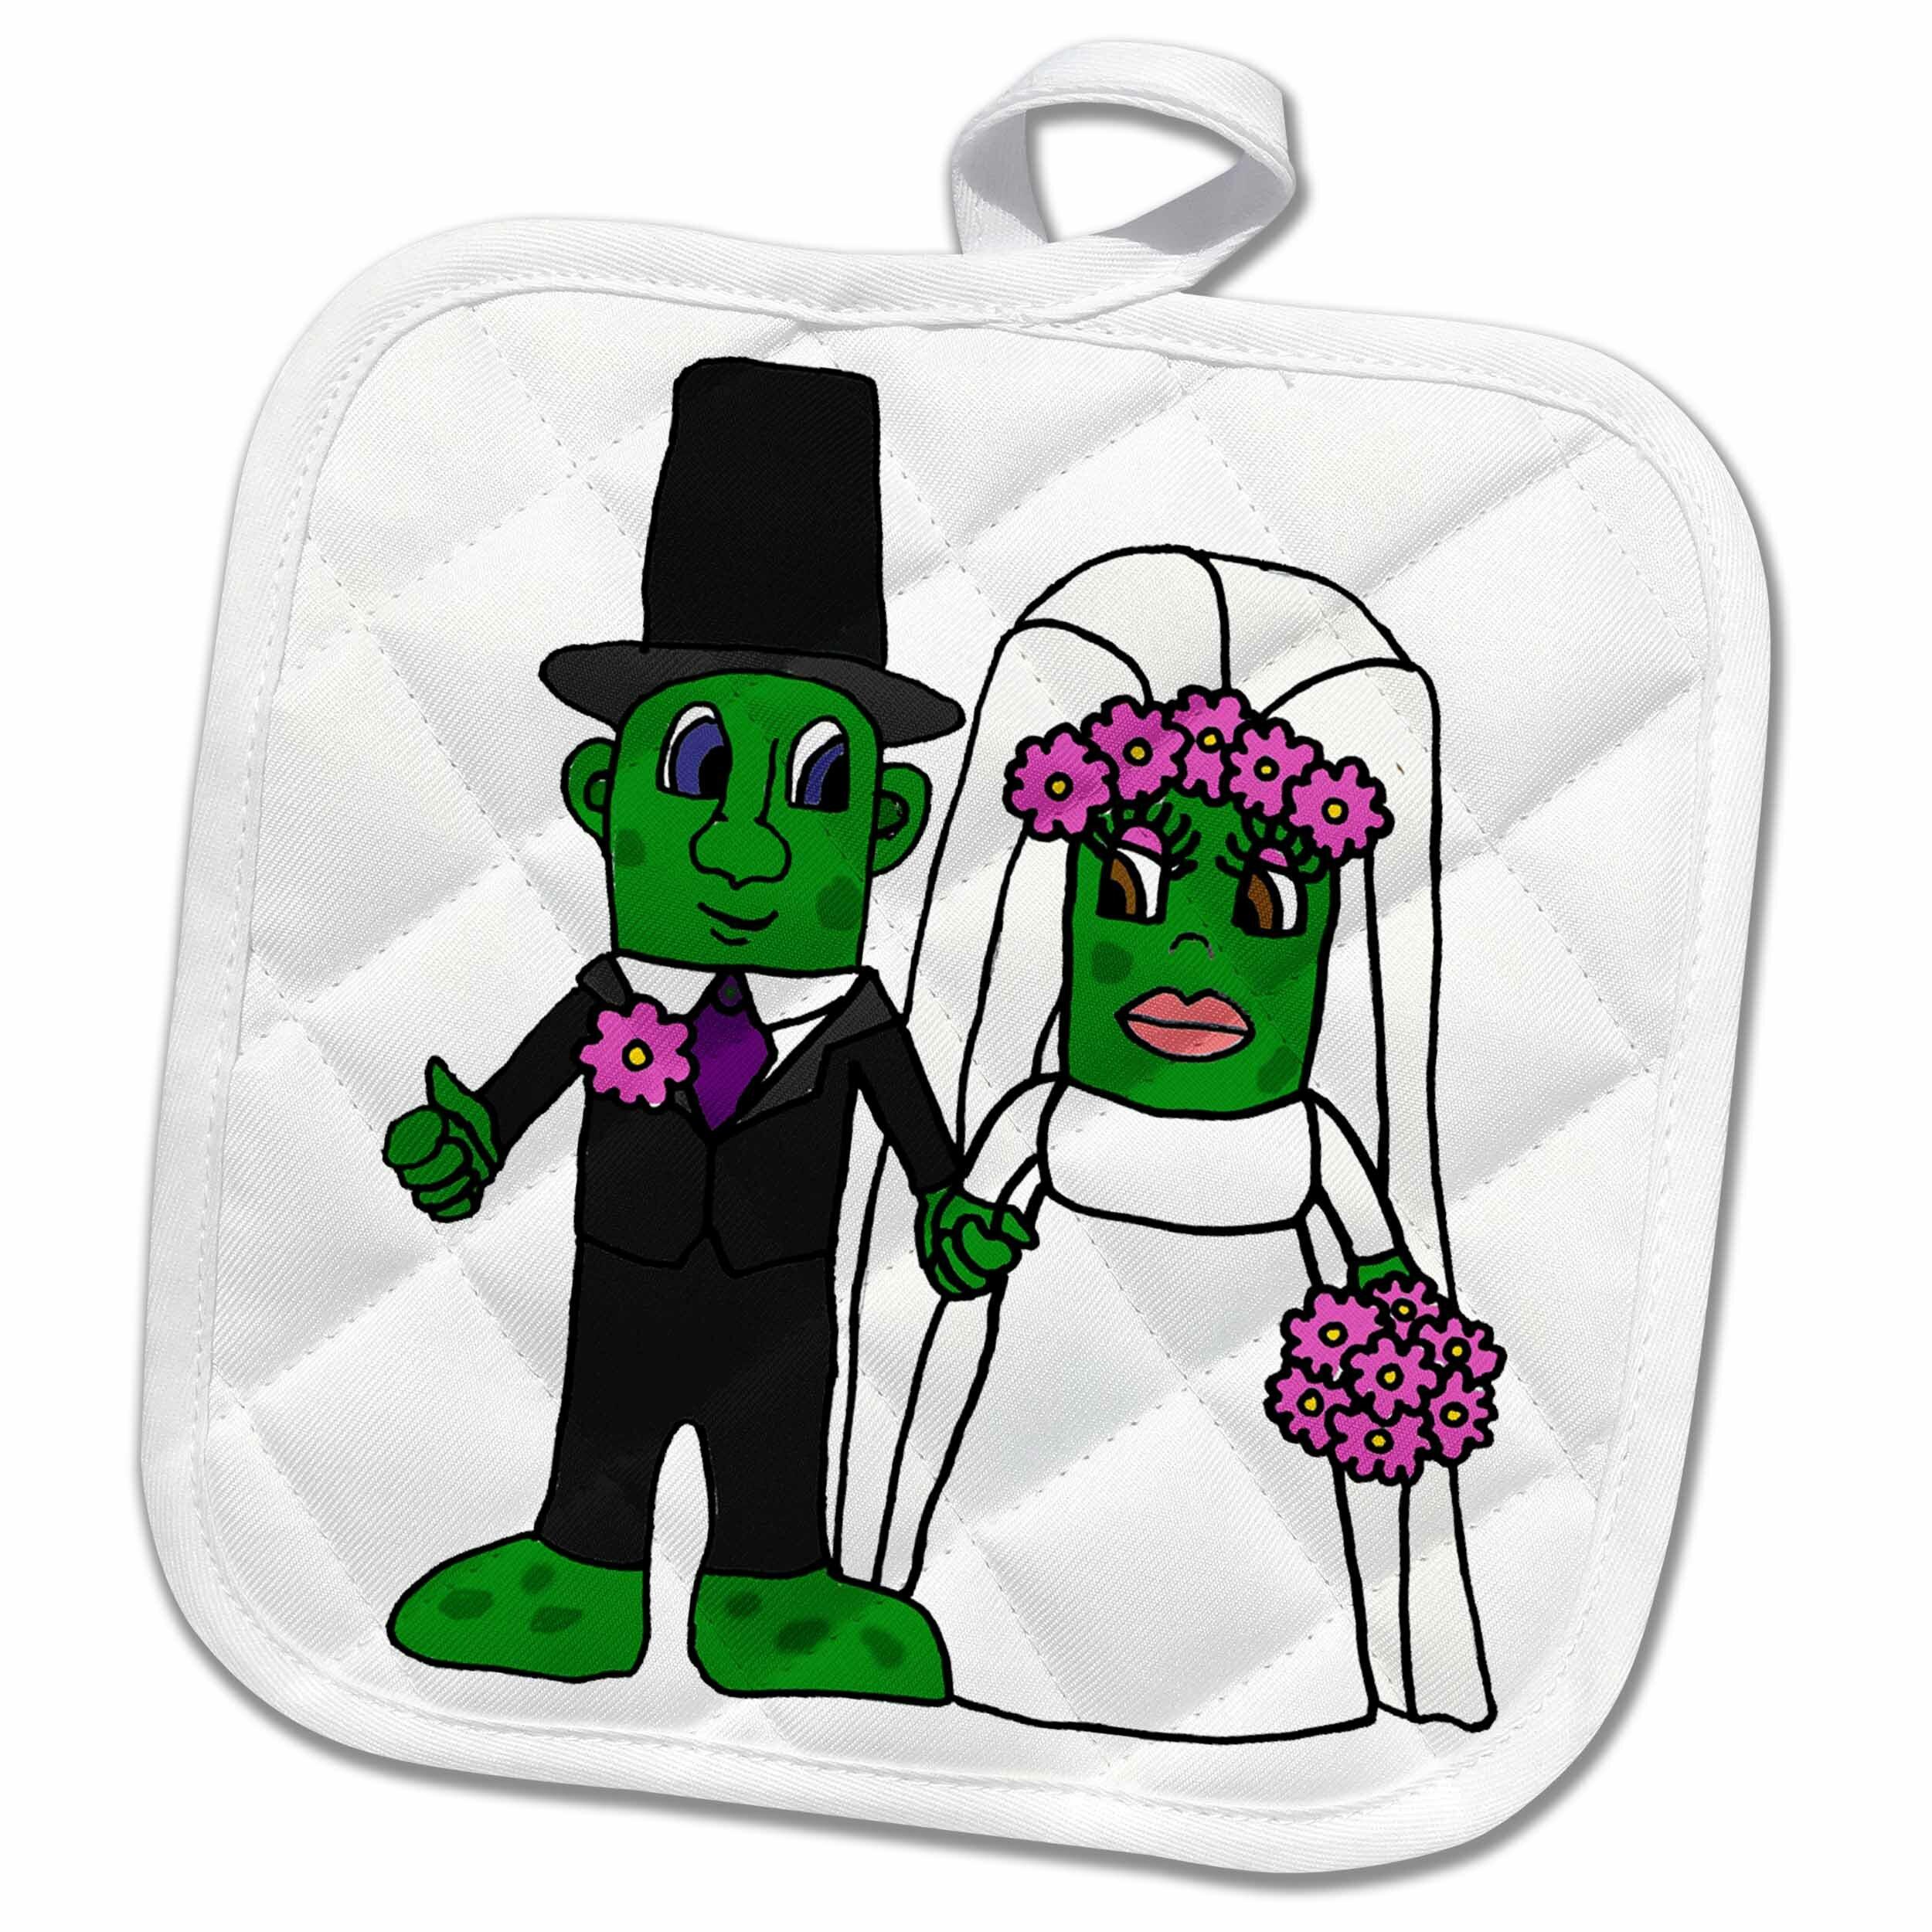 3drose Funny Bride And Groom Pickle Wedding Cartoon Potholder Wayfair